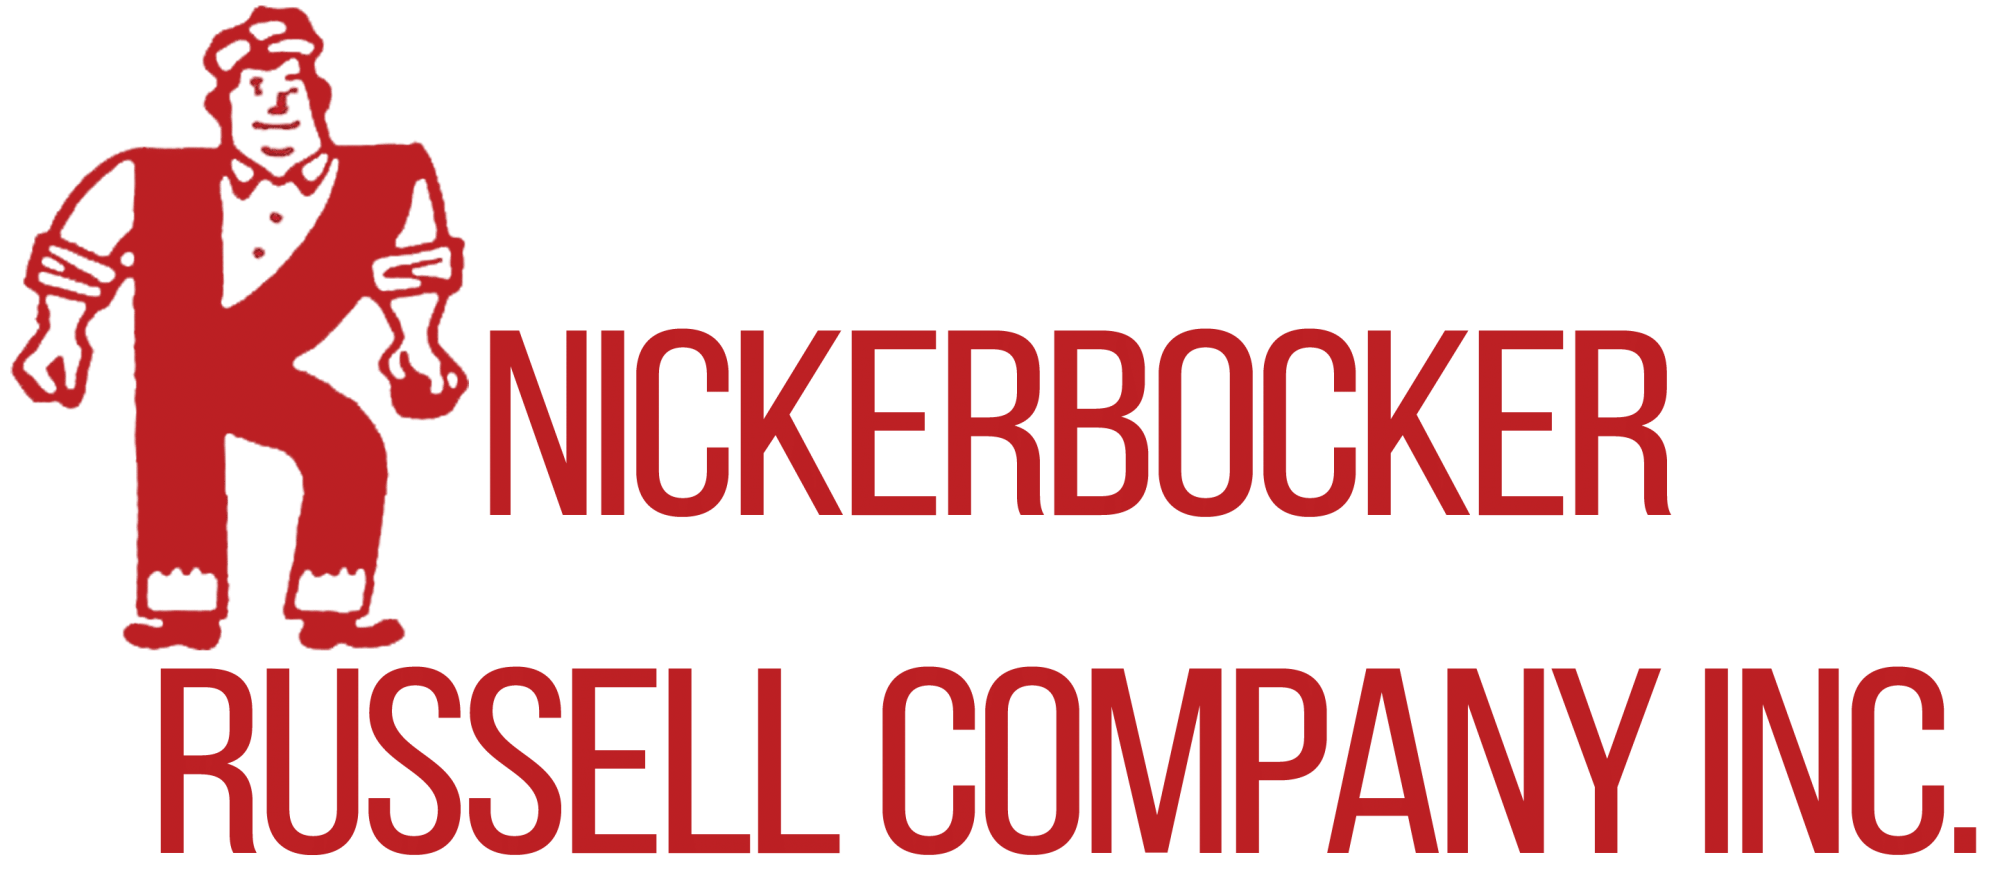 Equipment | Equipment Rental Pittsburgh | Knickerbocker